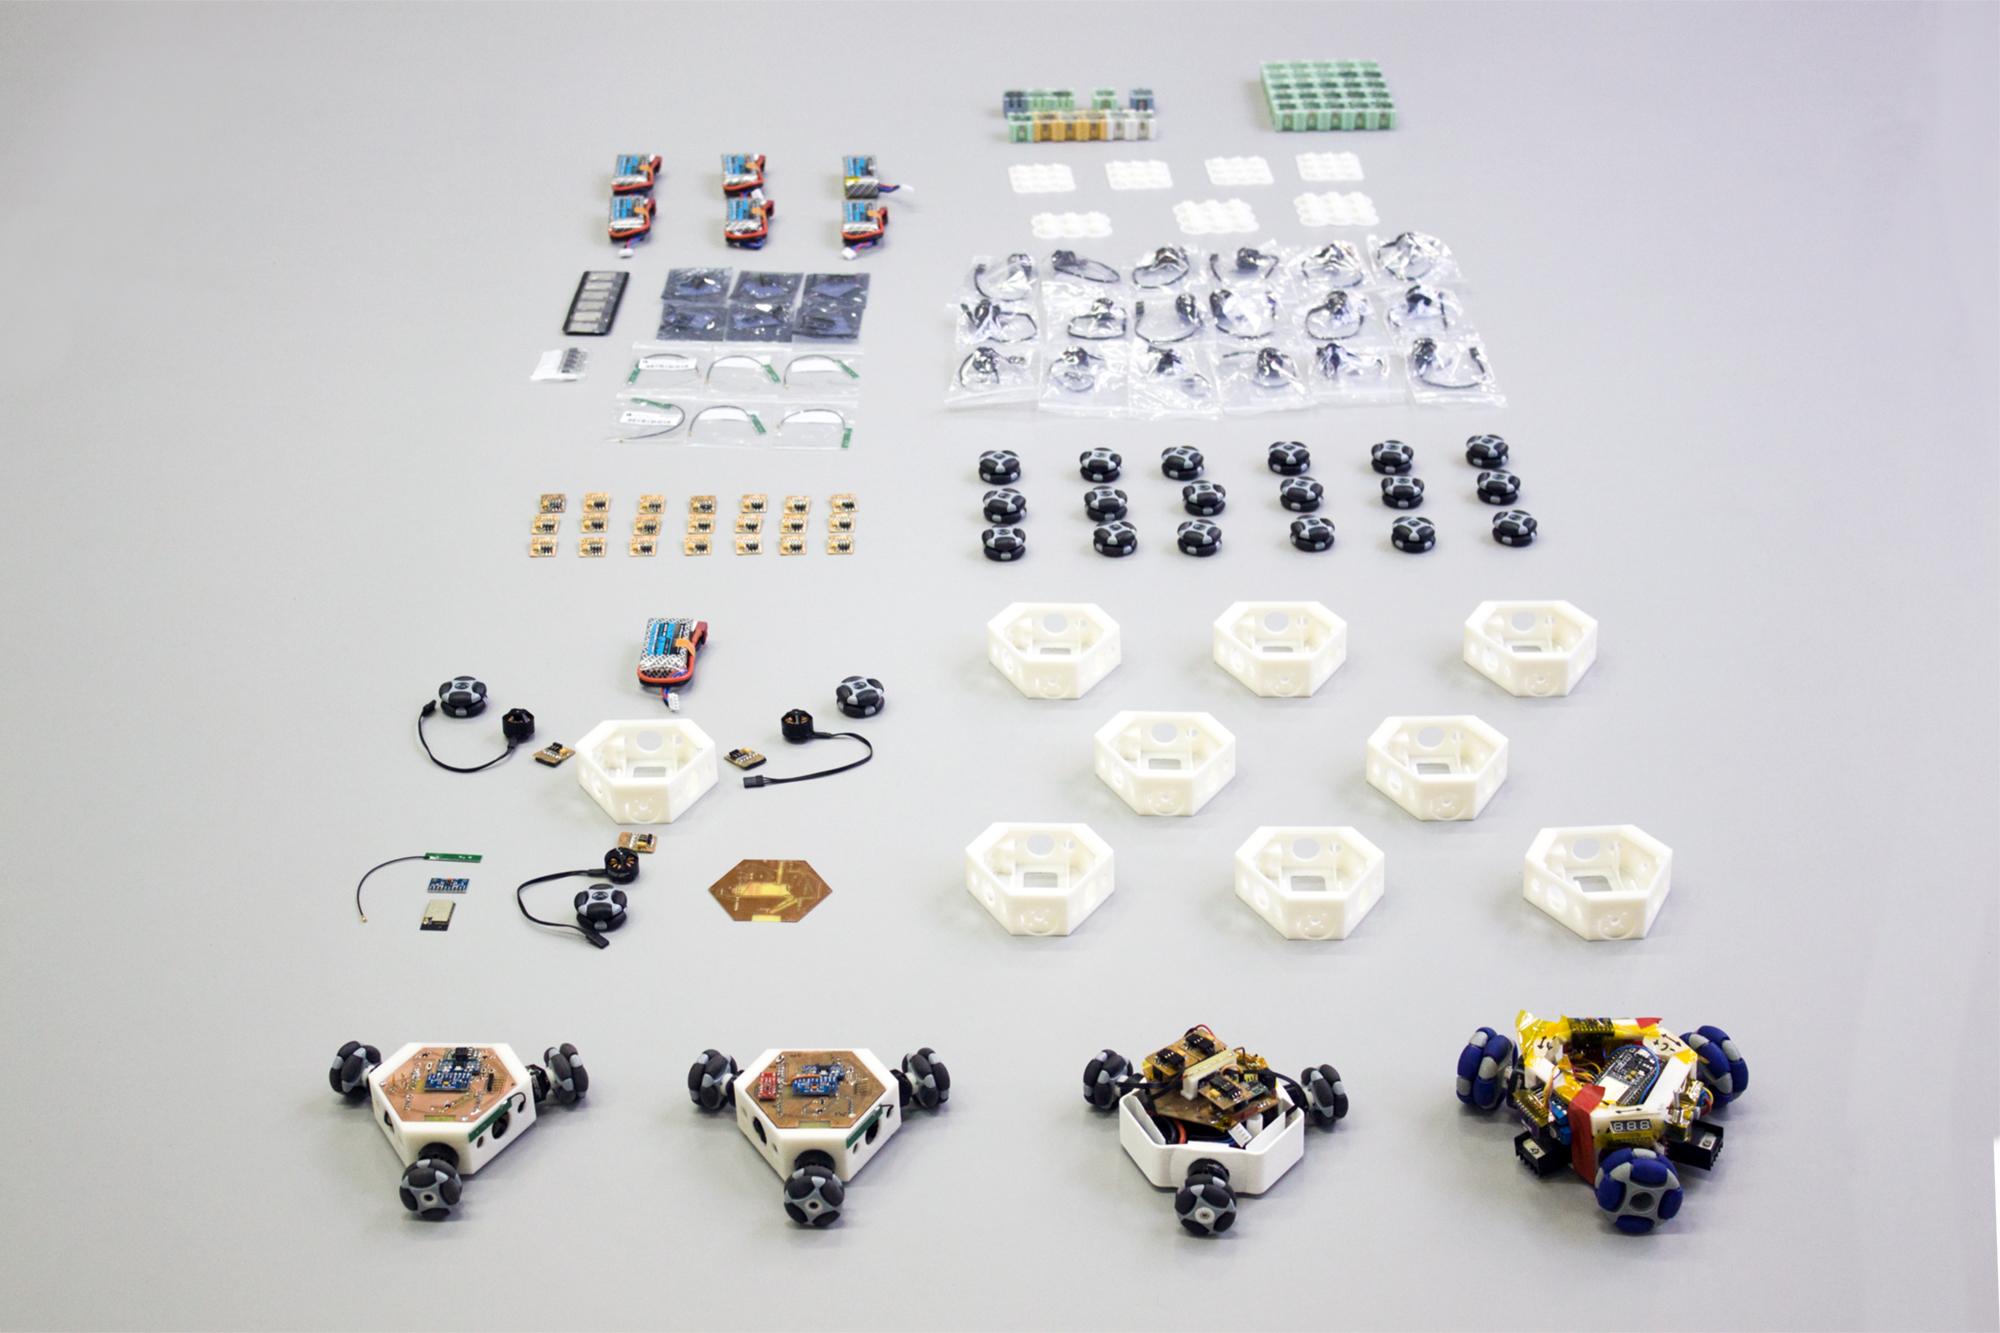 parts_spread_on_floor_0005_Layer 2